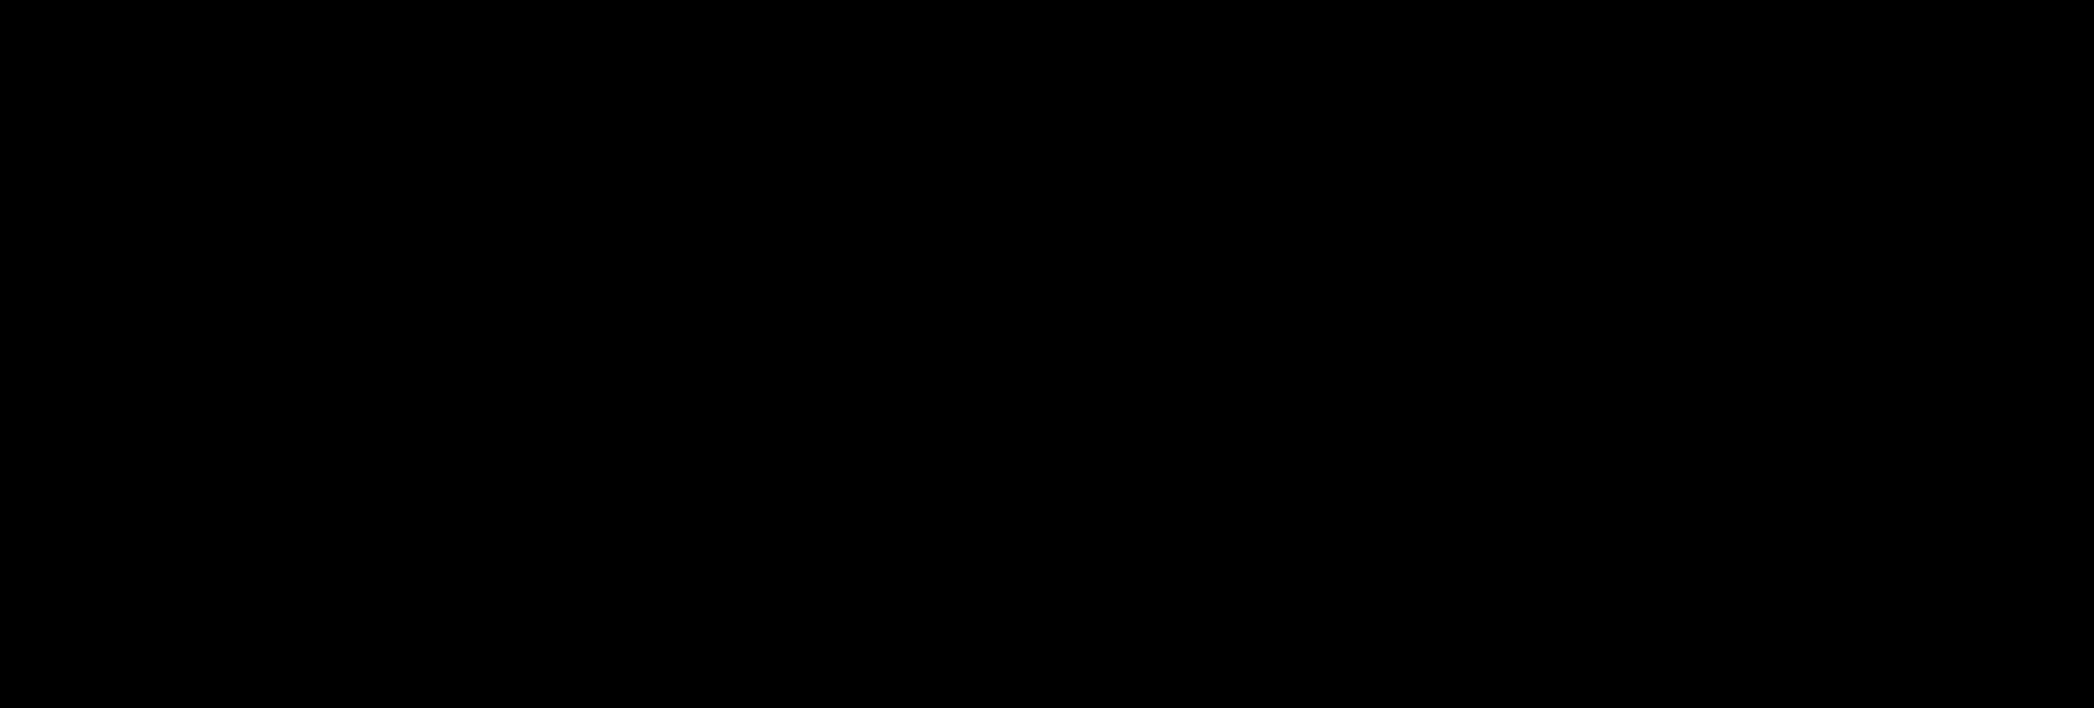 Ign-logo.png